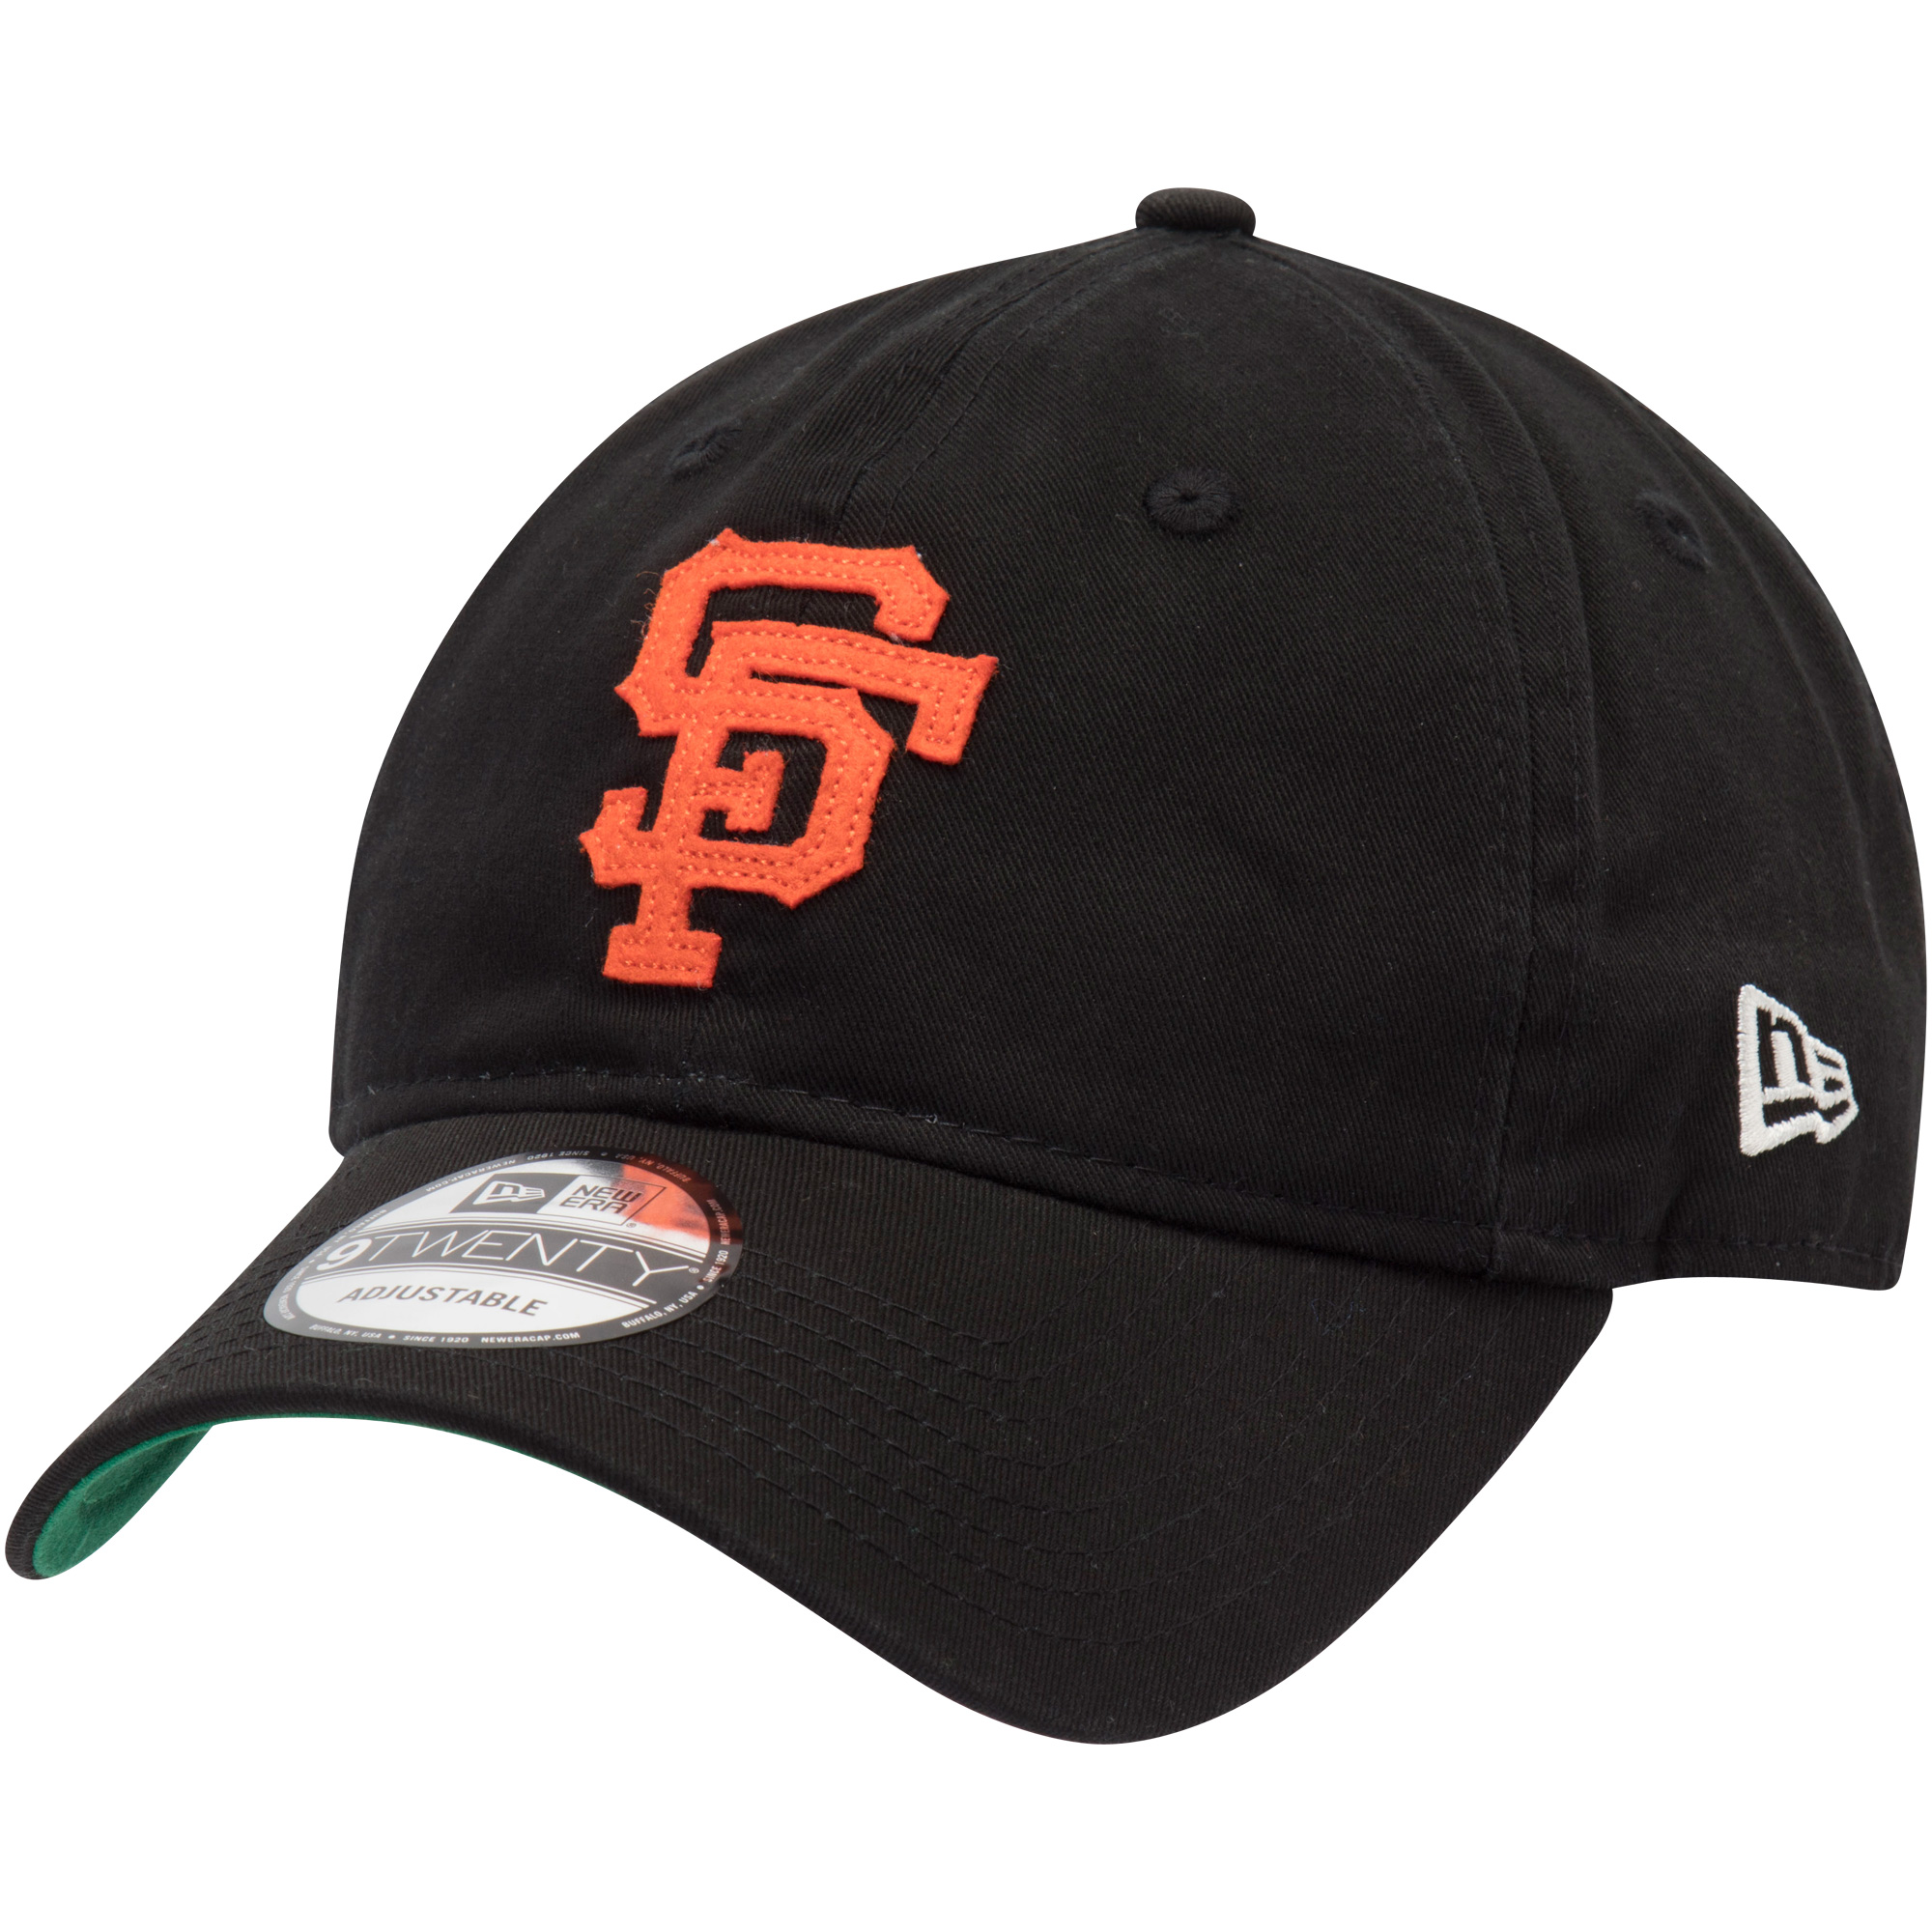 San Francisco Giants New Era Cooperstown Inaugural Season 9TWENTY Adjustable Hat - Black - OSFA